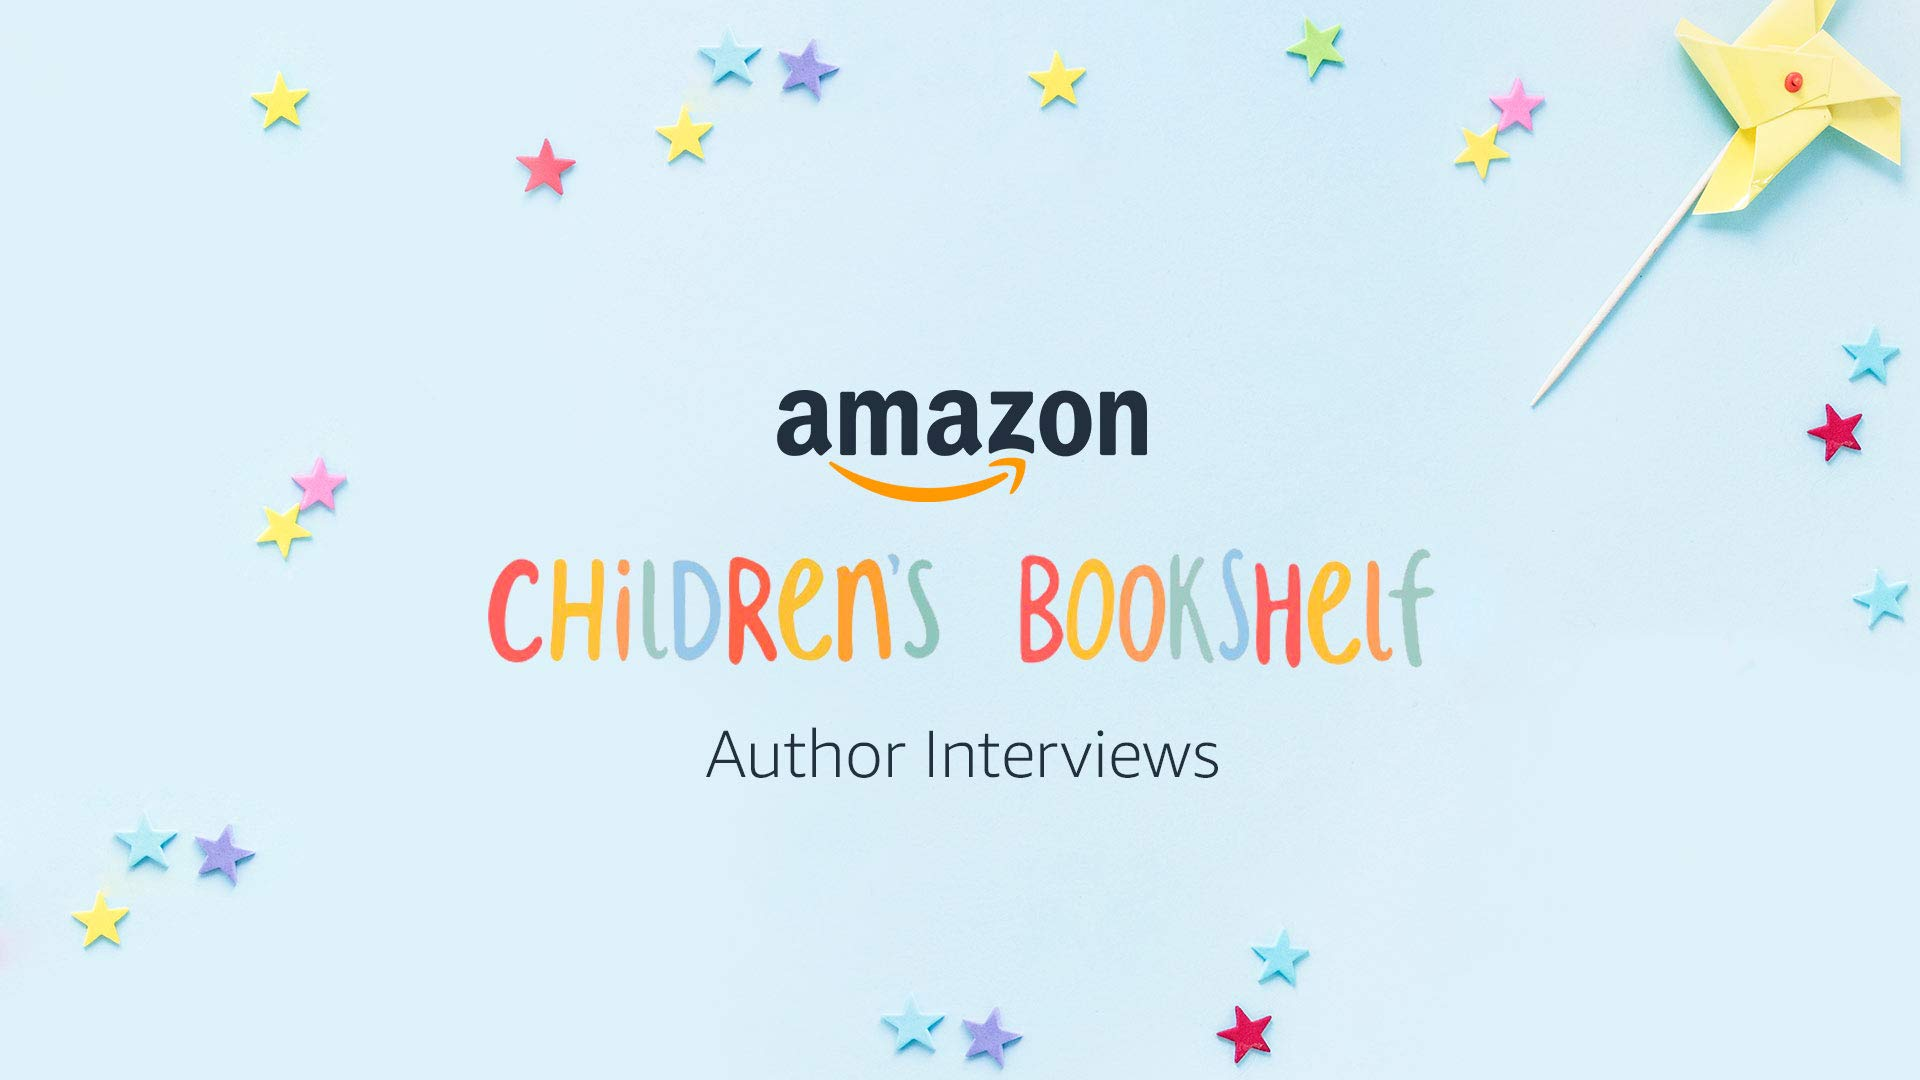 Amazon in: Children's Bookshelf